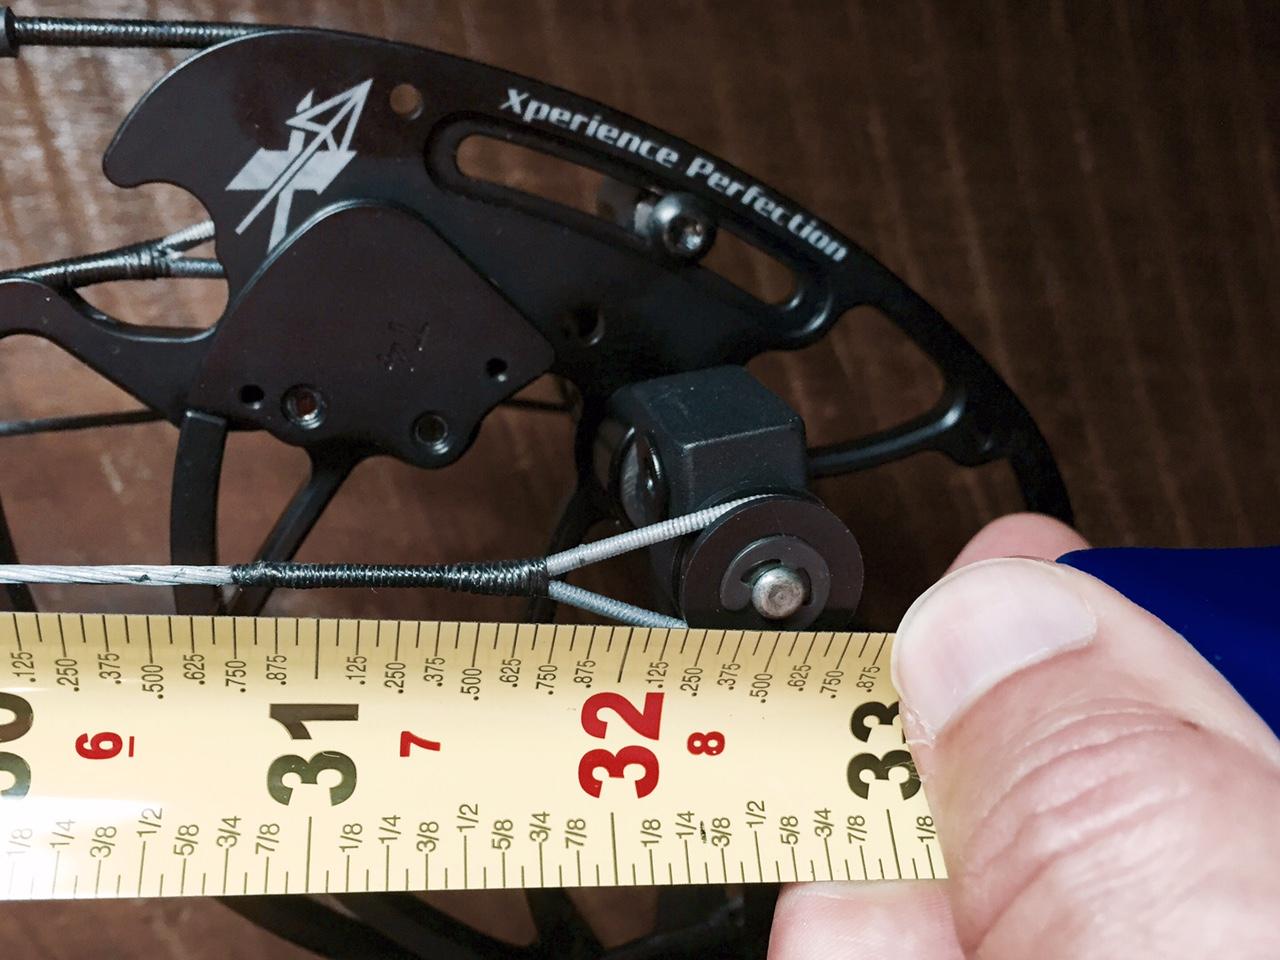 ATA Length, Christian Hunting Apparel, Christian Hunting T Shirts, Women's Archery Apparel, Archery T Shirts, Kids Archery T Shirts